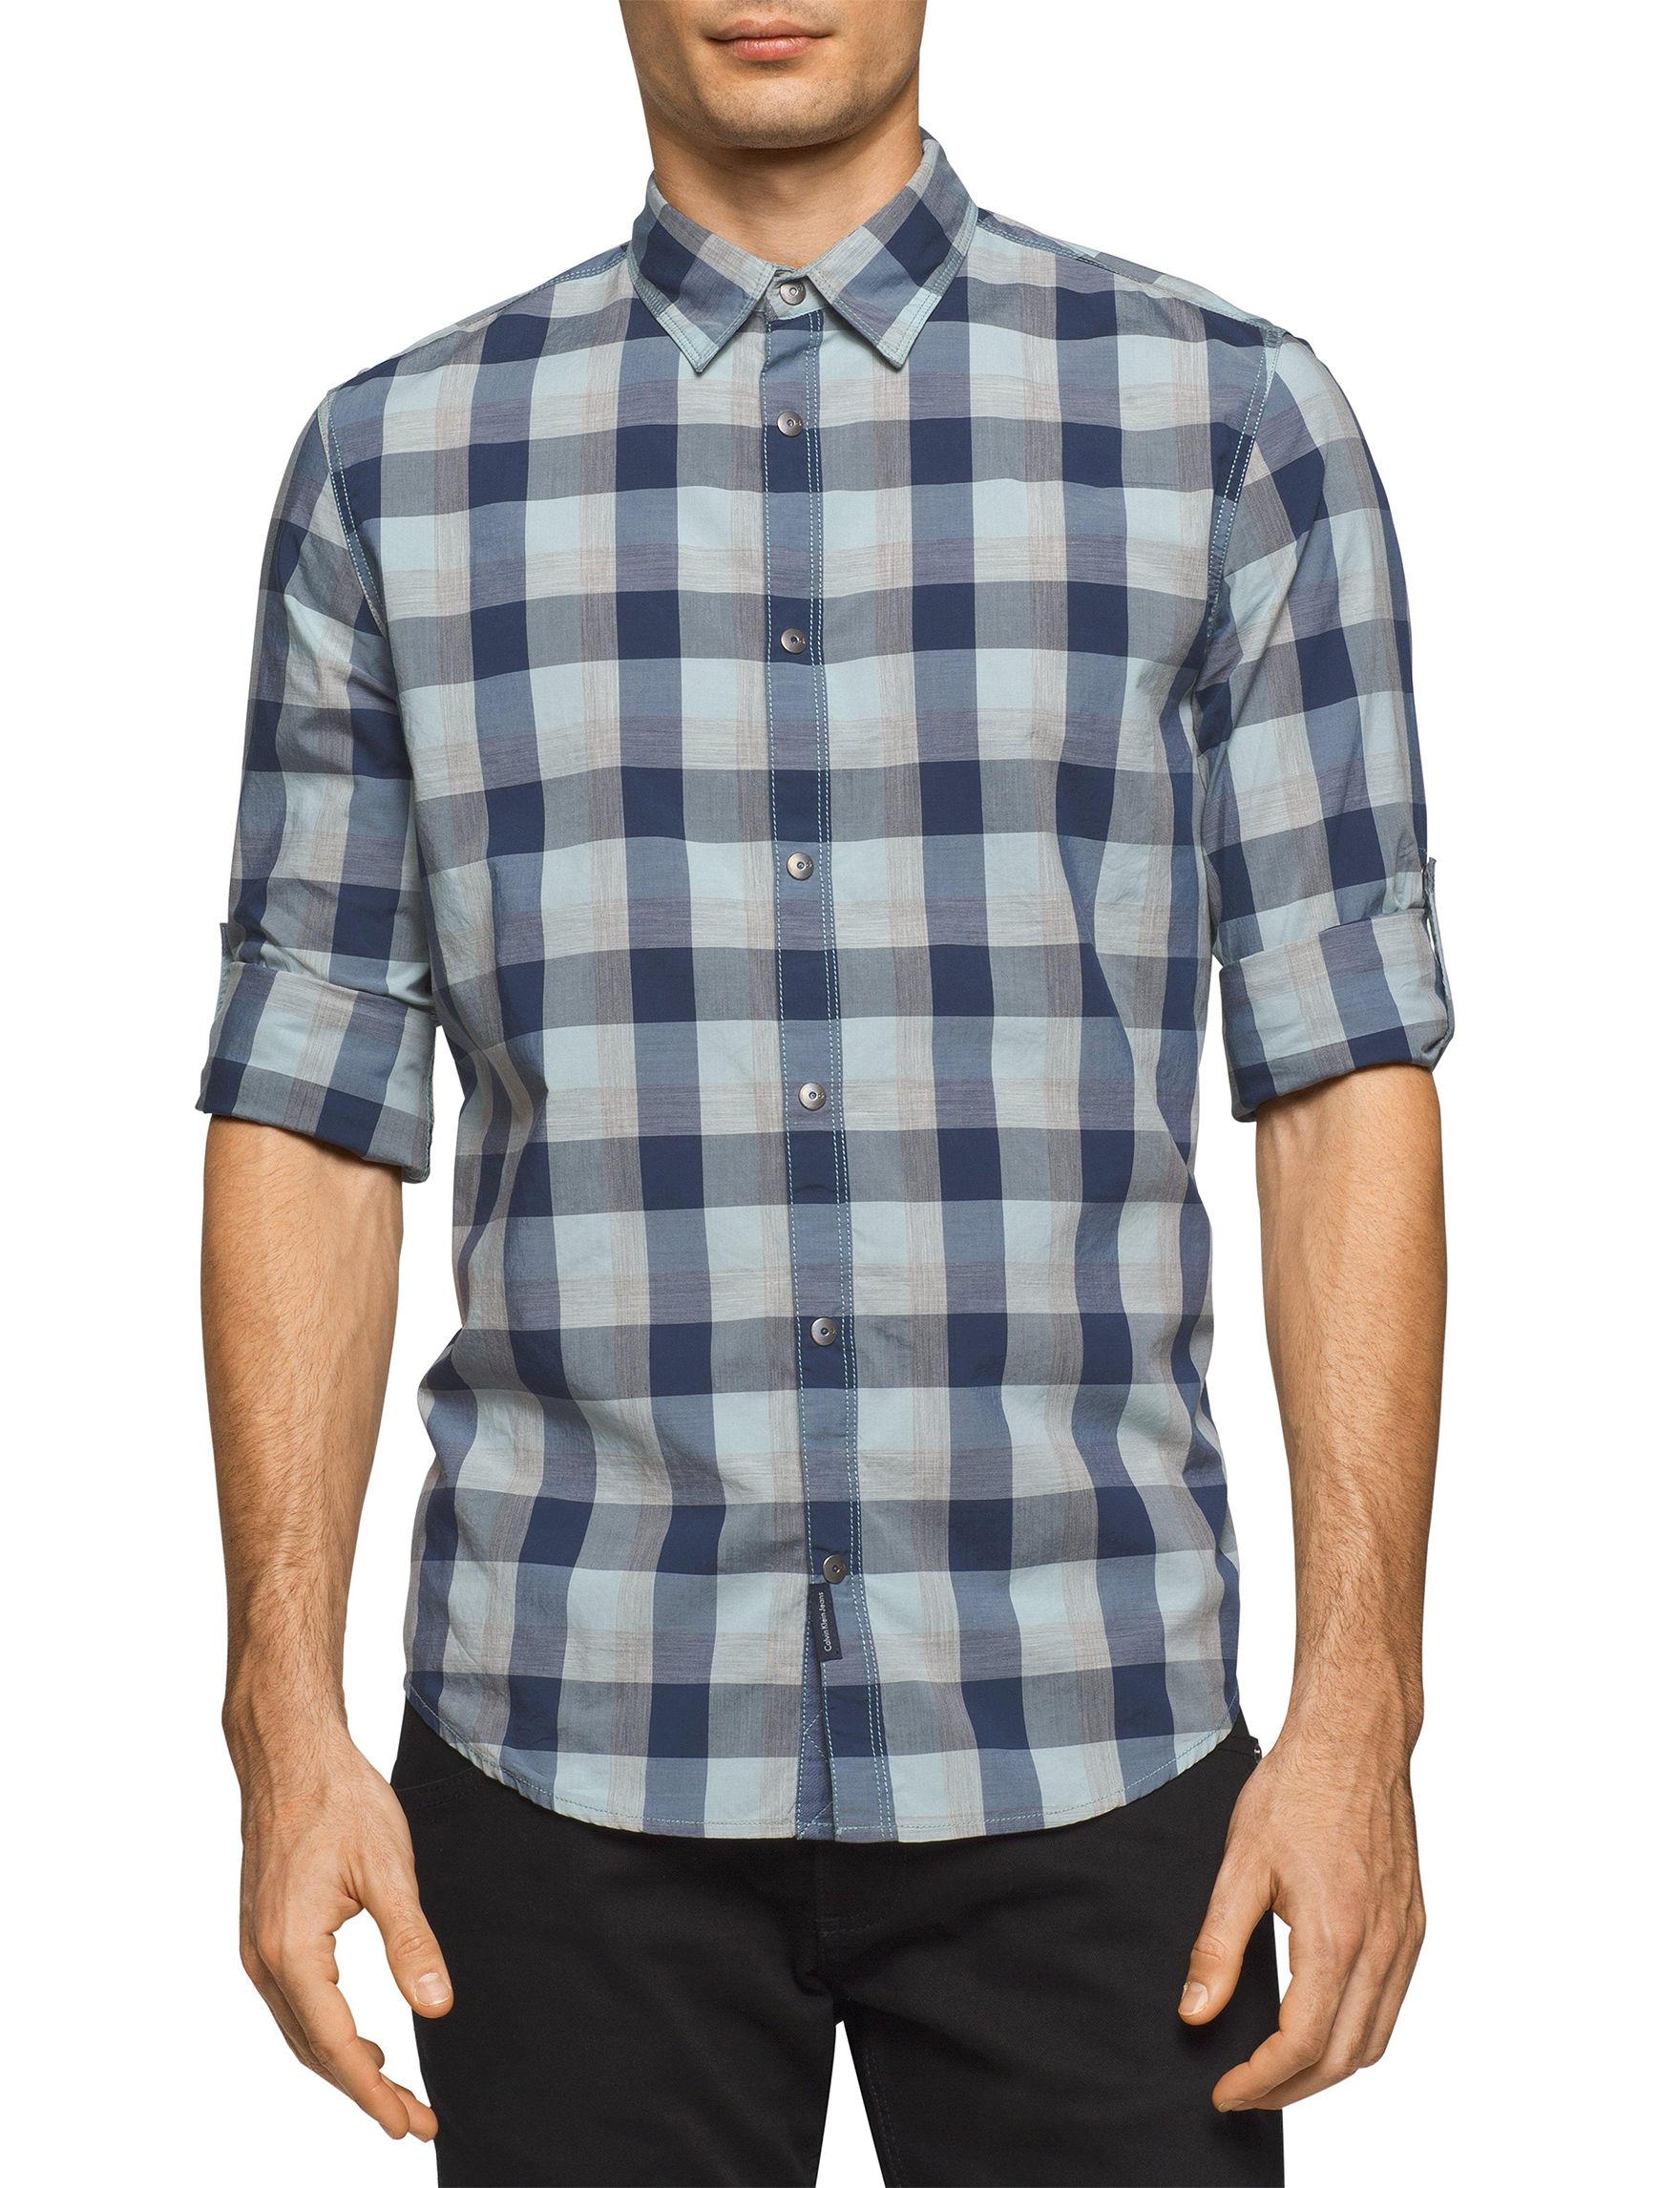 Calvin Klein Porcelain Casual Button Down Shirts